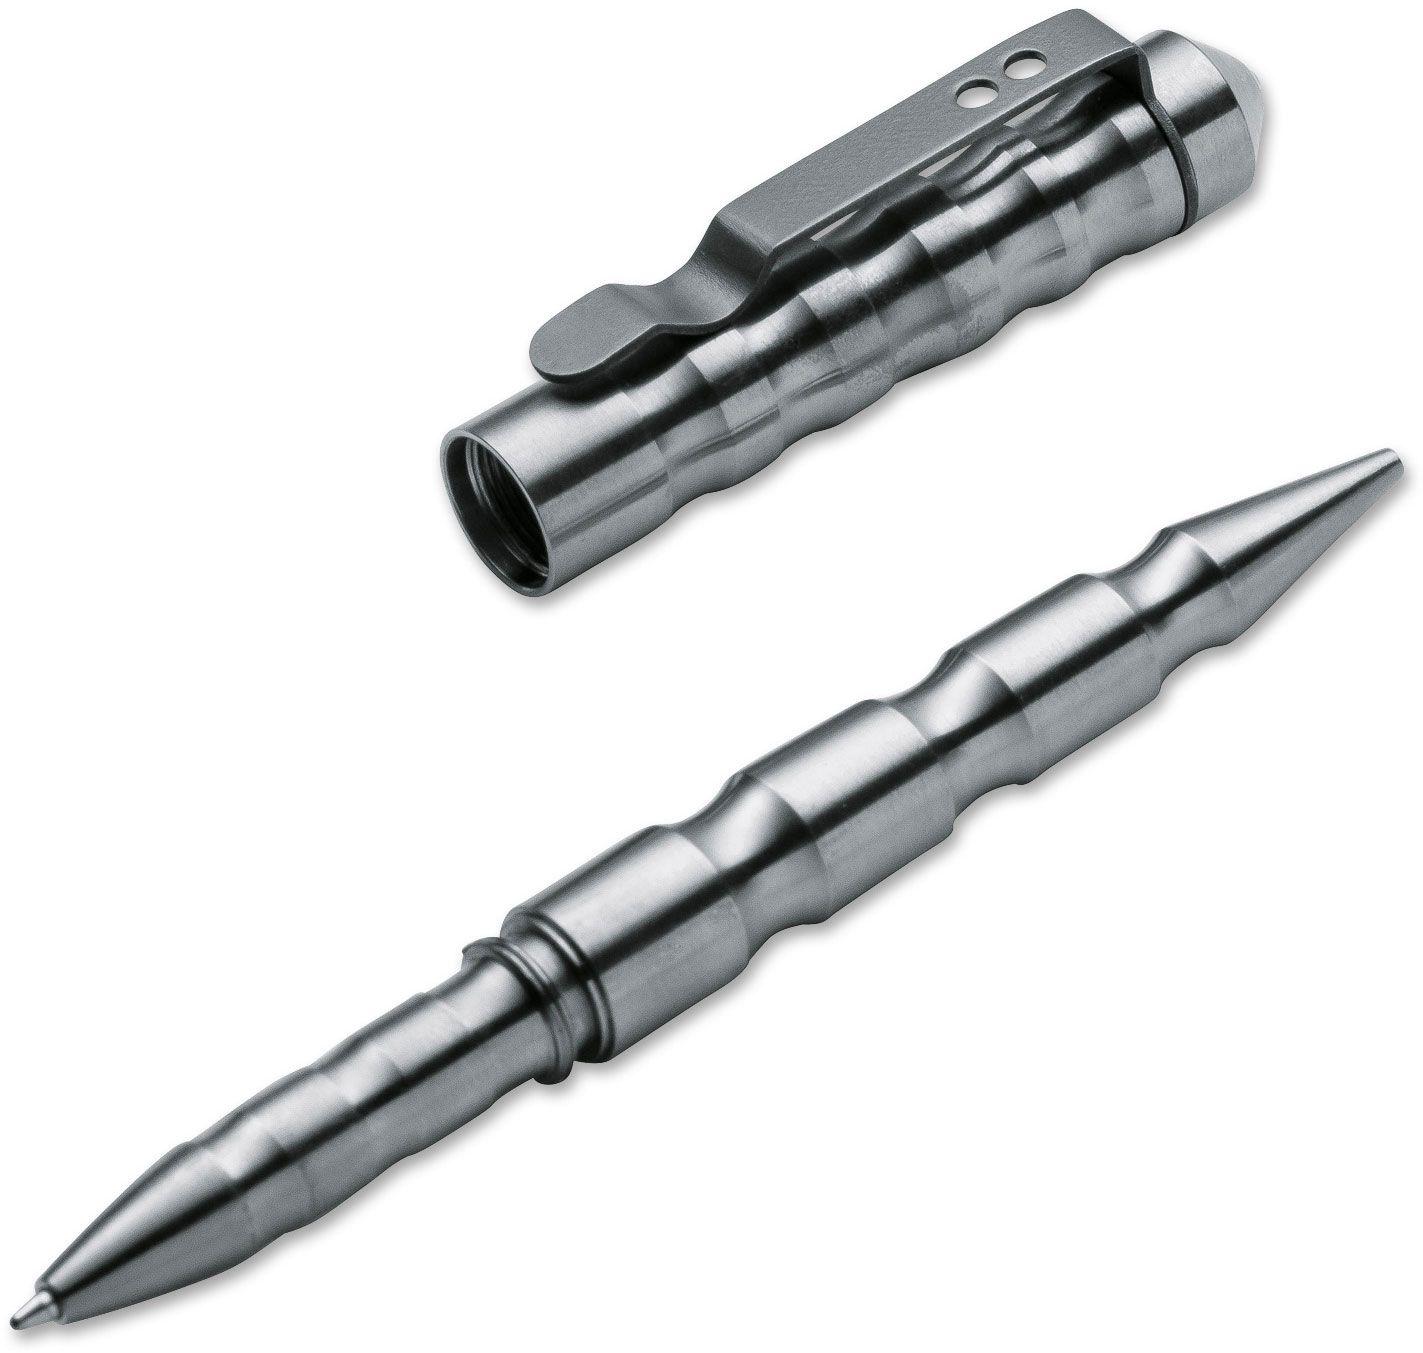 Boker Plus MPP Multi-Purpose Tactical Pen, Satin Titanium